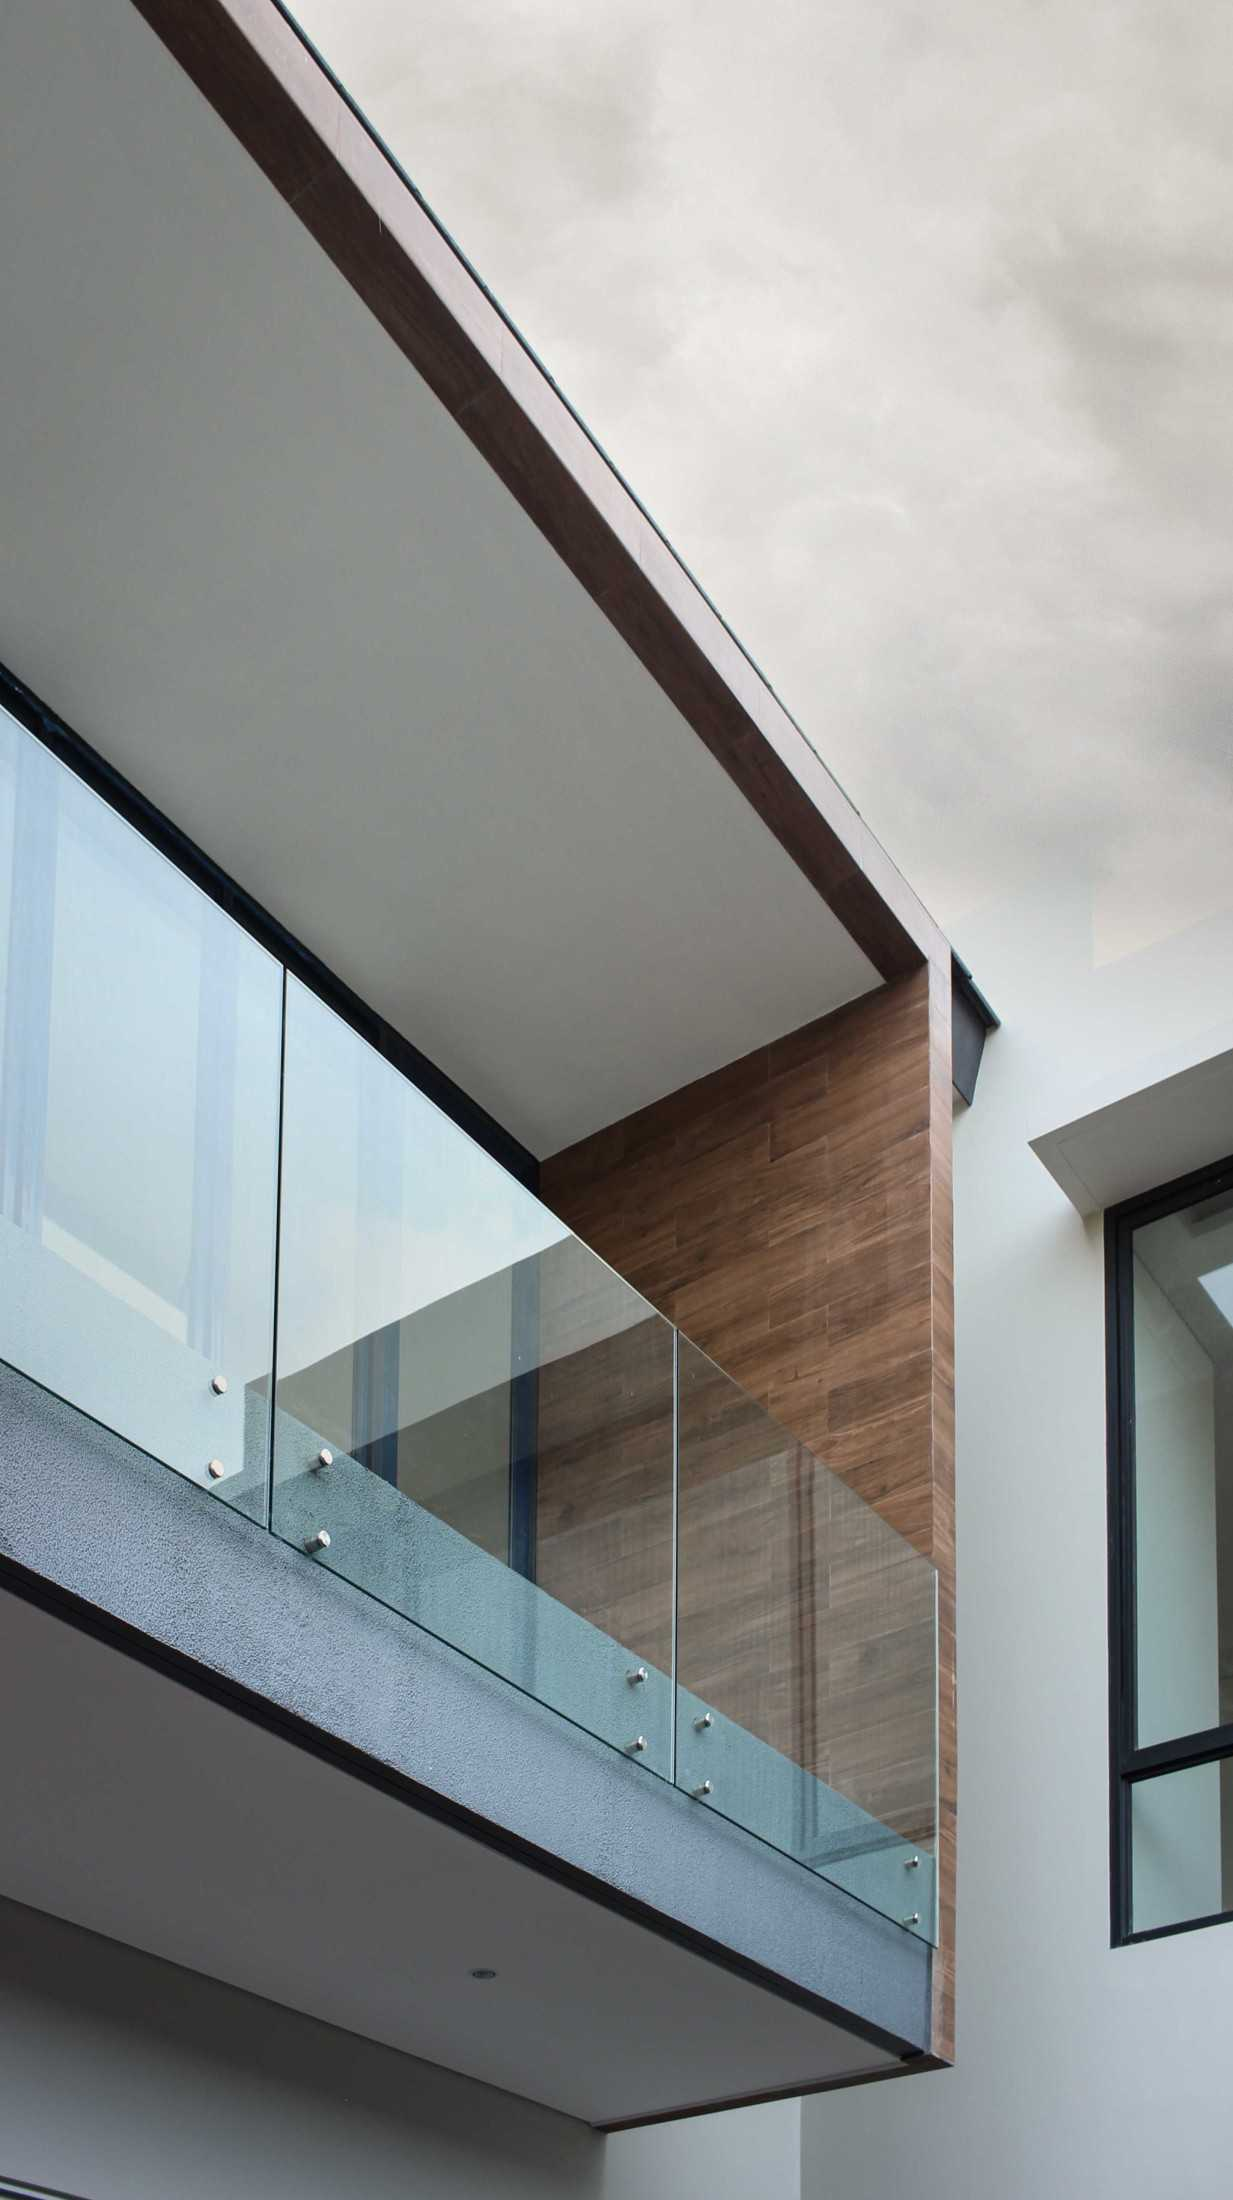 Y0 Design Architect S House Kec. Srono, Kabupaten Banyuwangi, Jawa Timur, Indonesia Kec. Srono, Kabupaten Banyuwangi, Jawa Timur, Indonesia Yohanes-Iswara-Limandjaya-S-House  121082